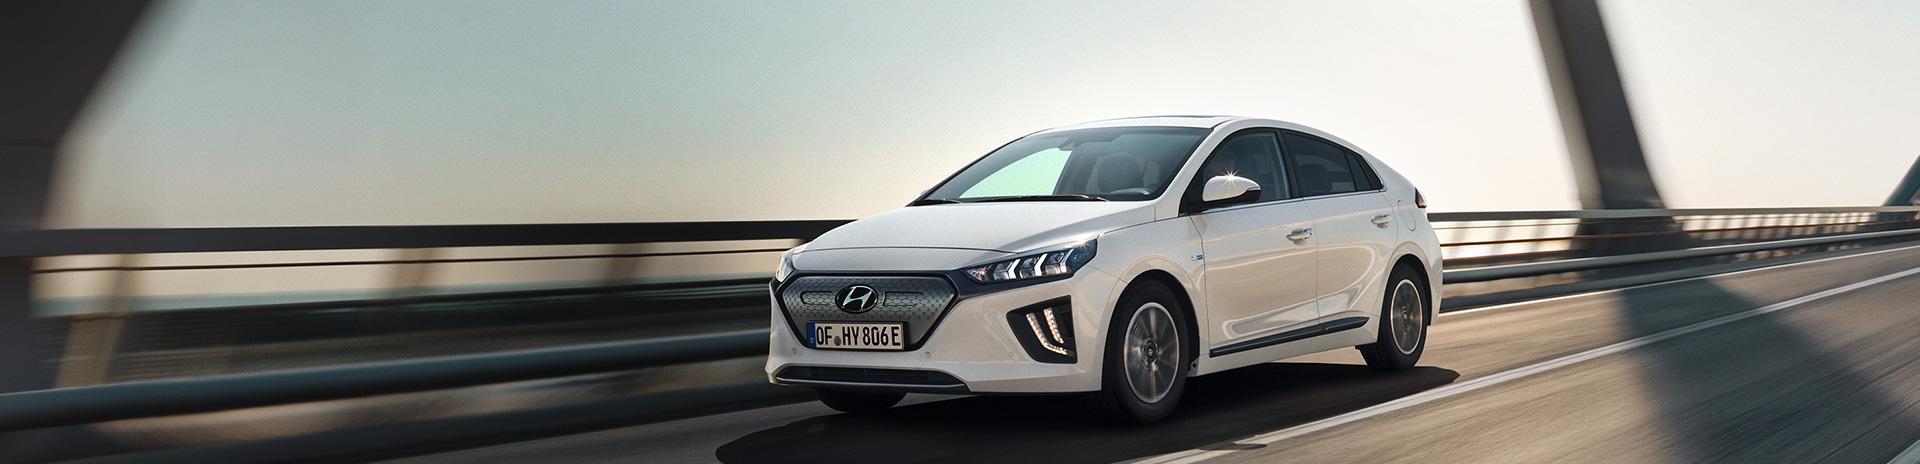 Új Hyundai Ioniq Electric